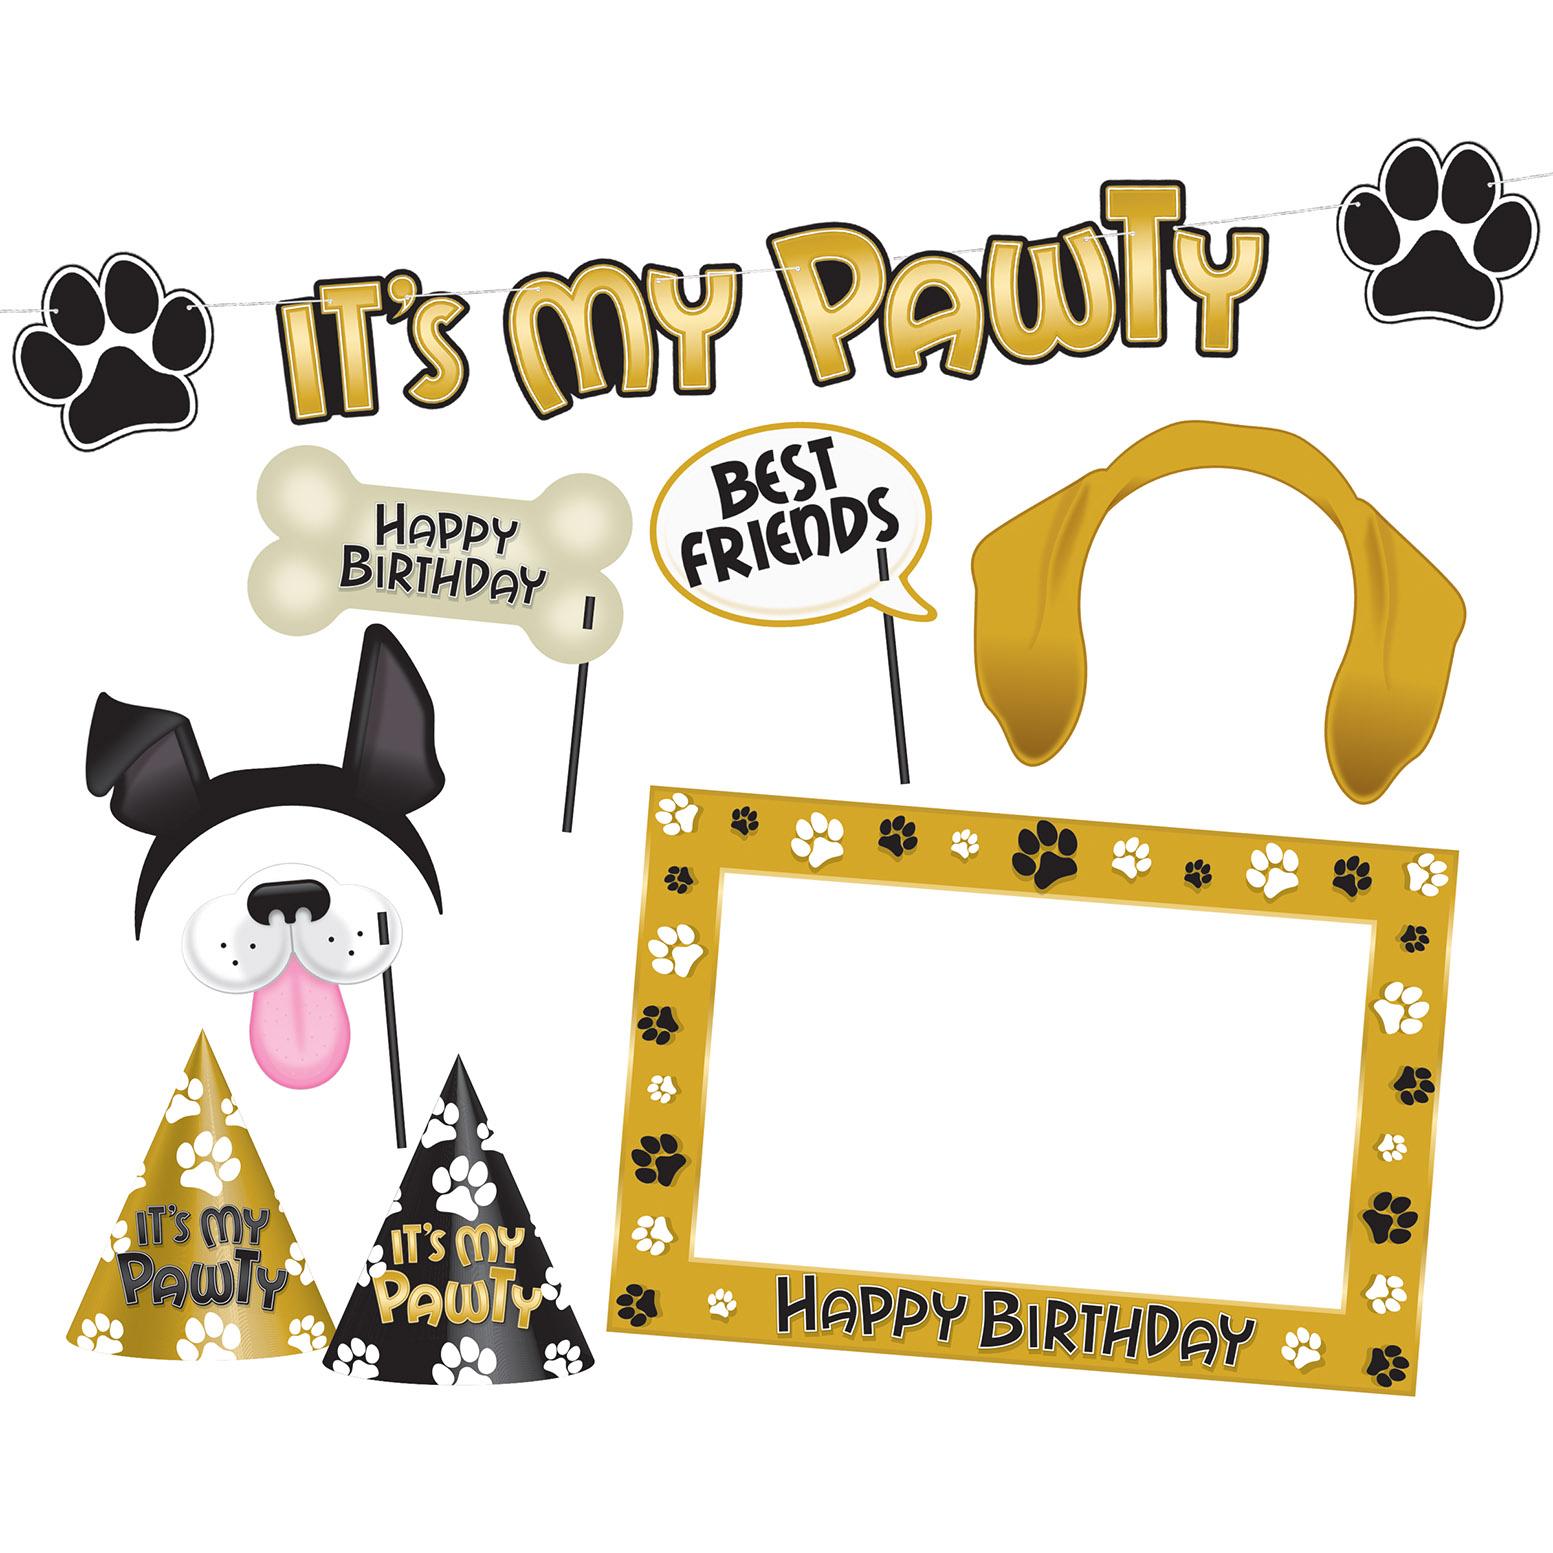 DOG BIRTHDAY PARTY KIT (12) image